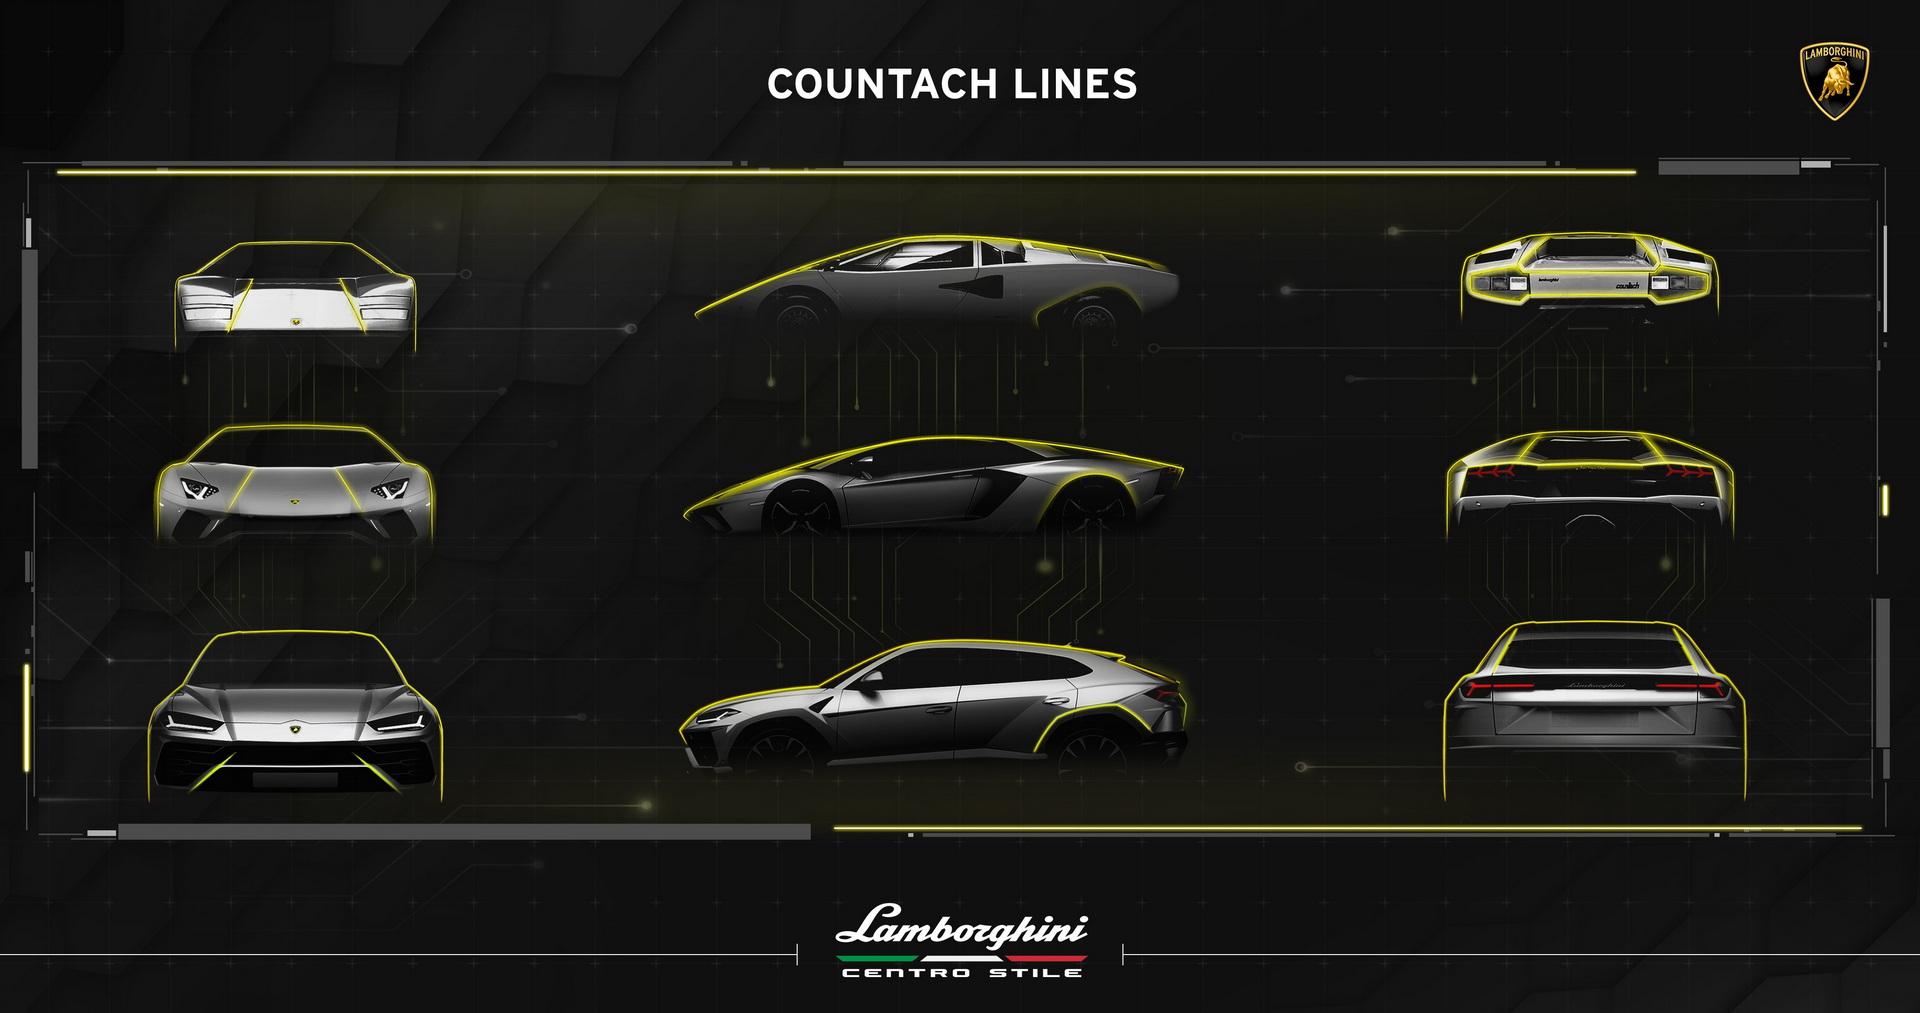 1971-Lamborghini-Countach-Design-DNA-5.jpg